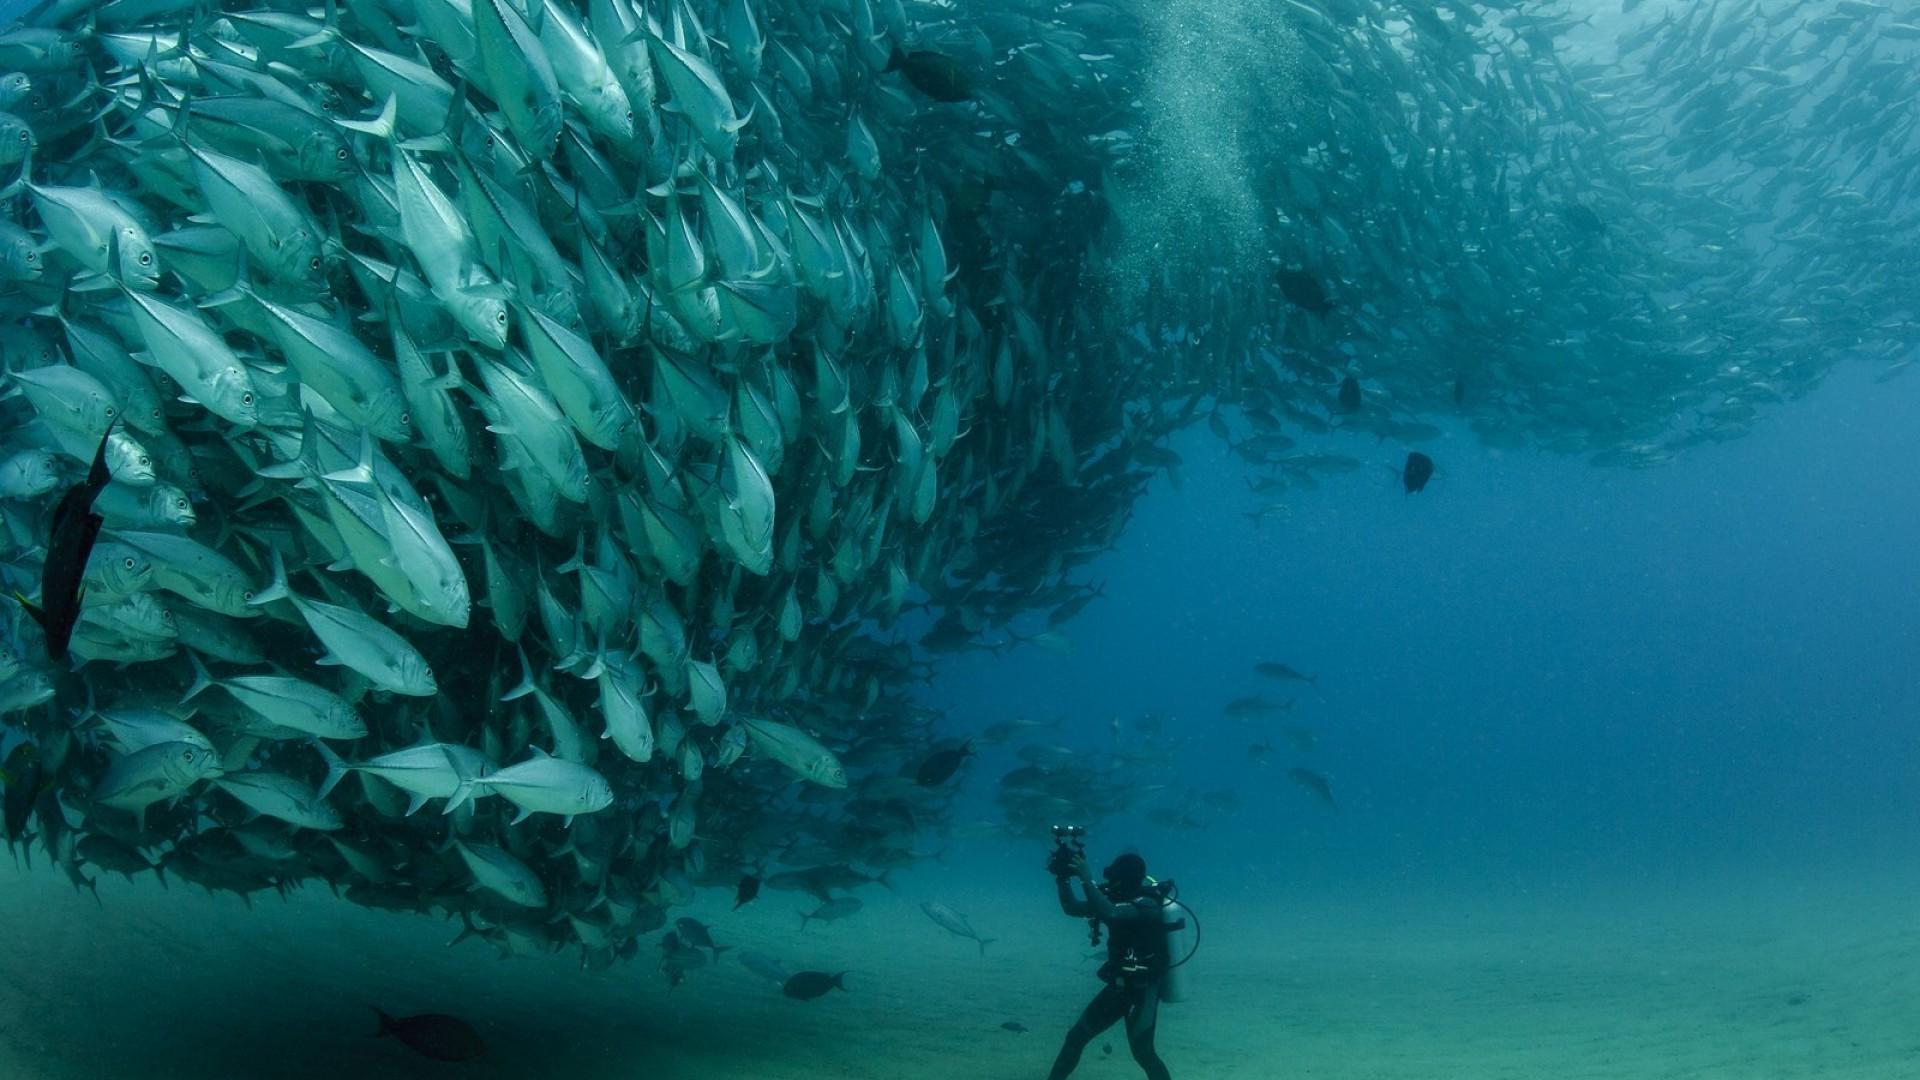 1920x1080 Px Animals Fish Nature Photography Scuba Diving Sea